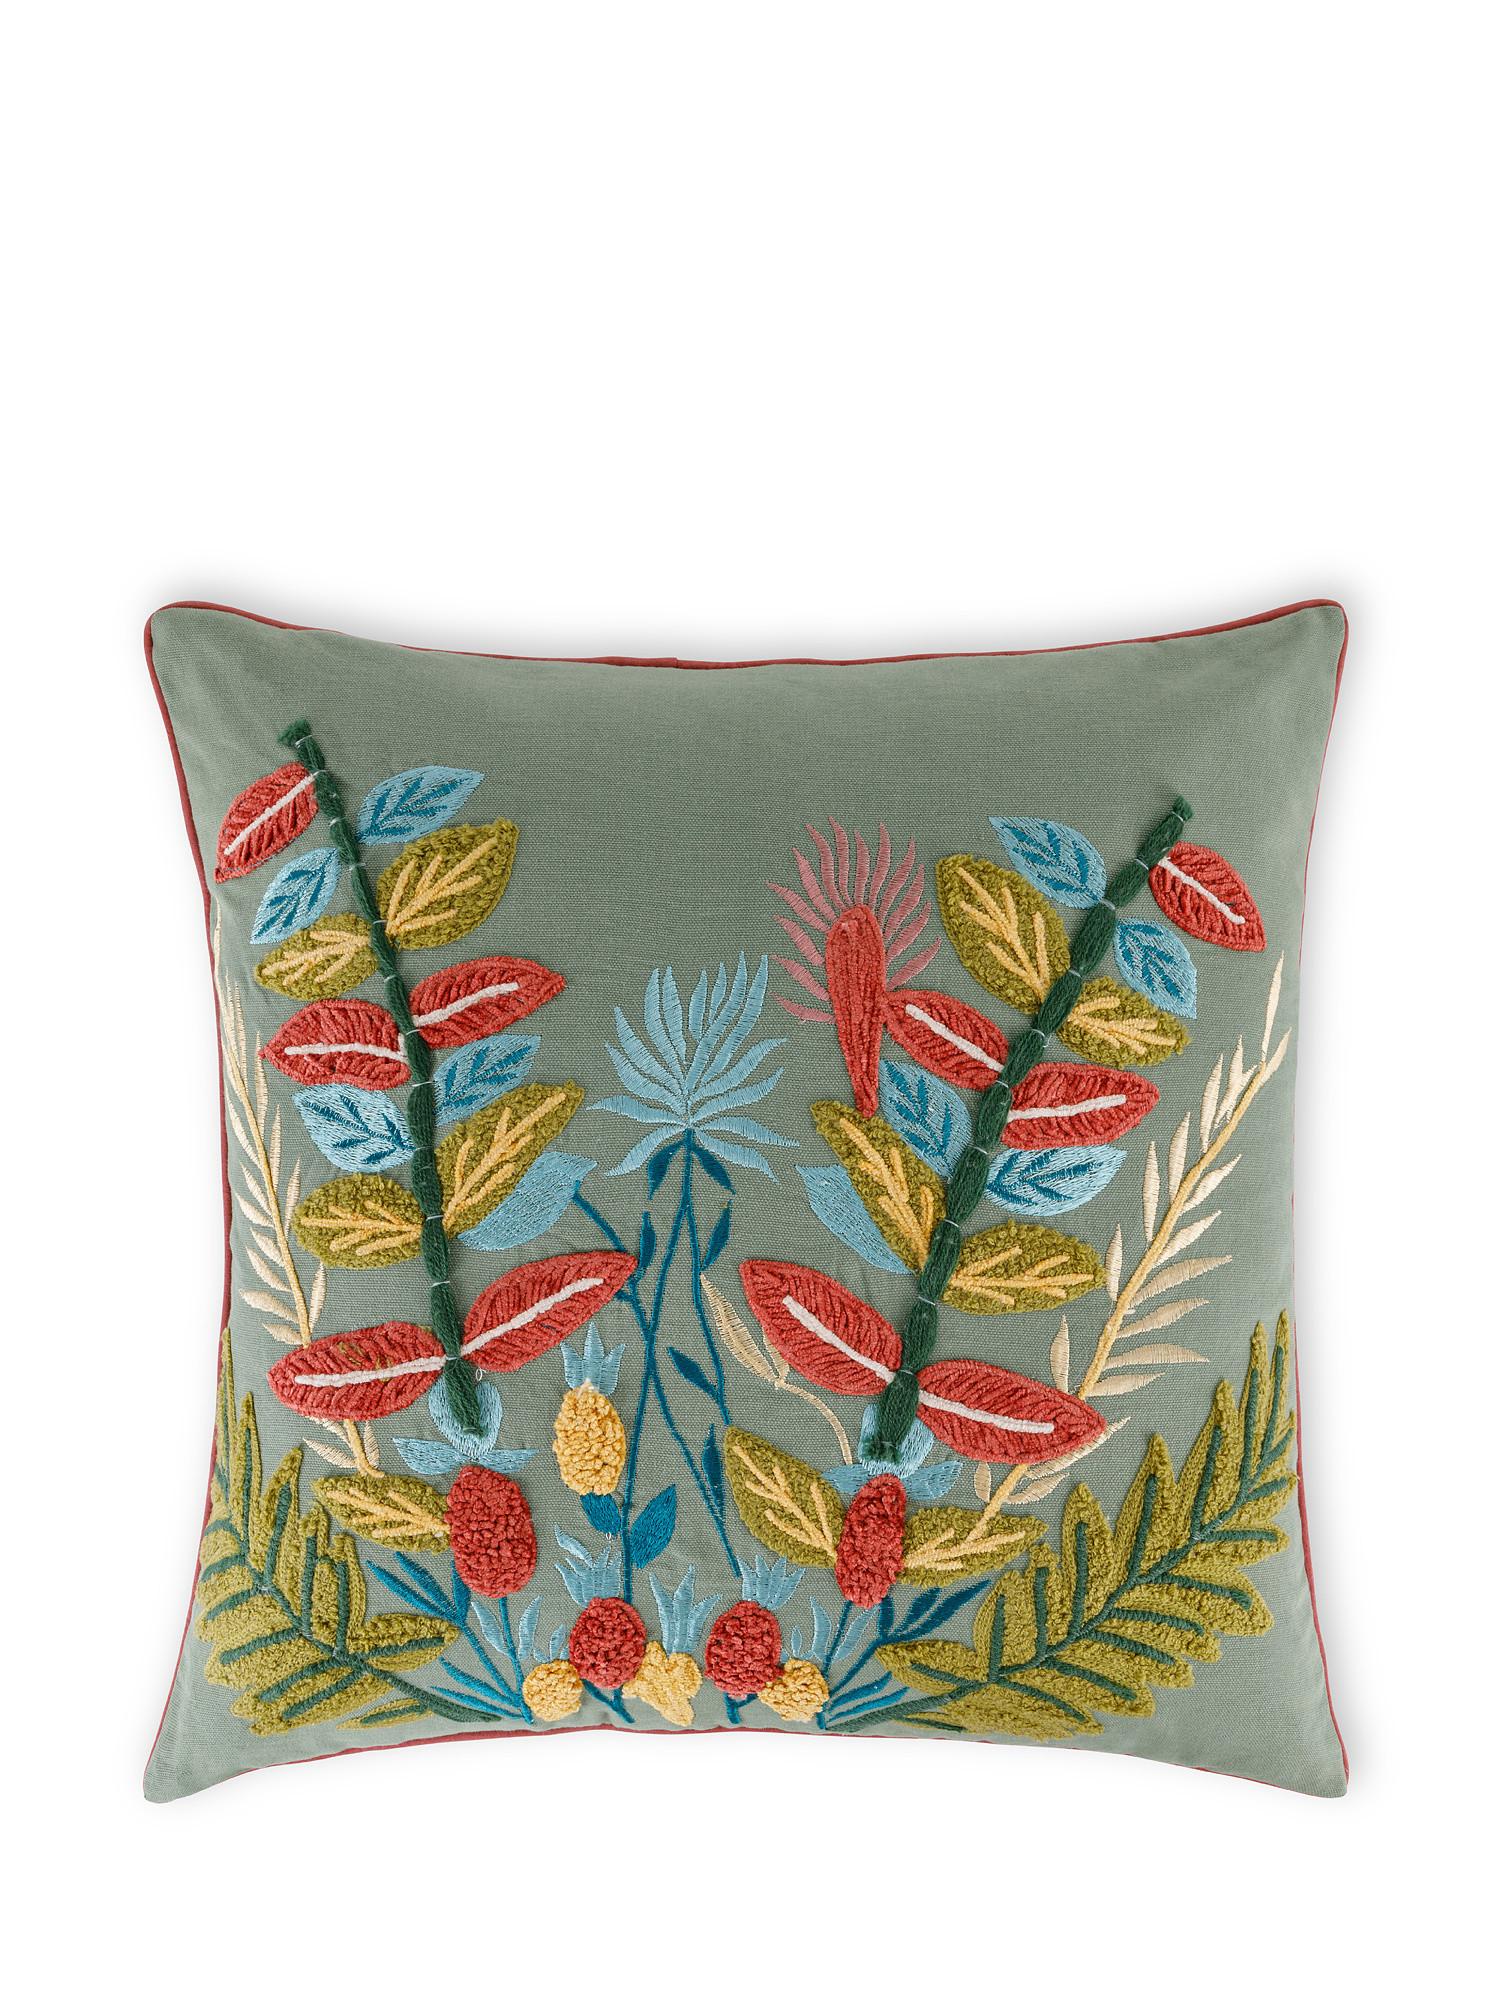 Cuscino cotone ricamo floreale 45x45cm, Multicolor, large image number 0